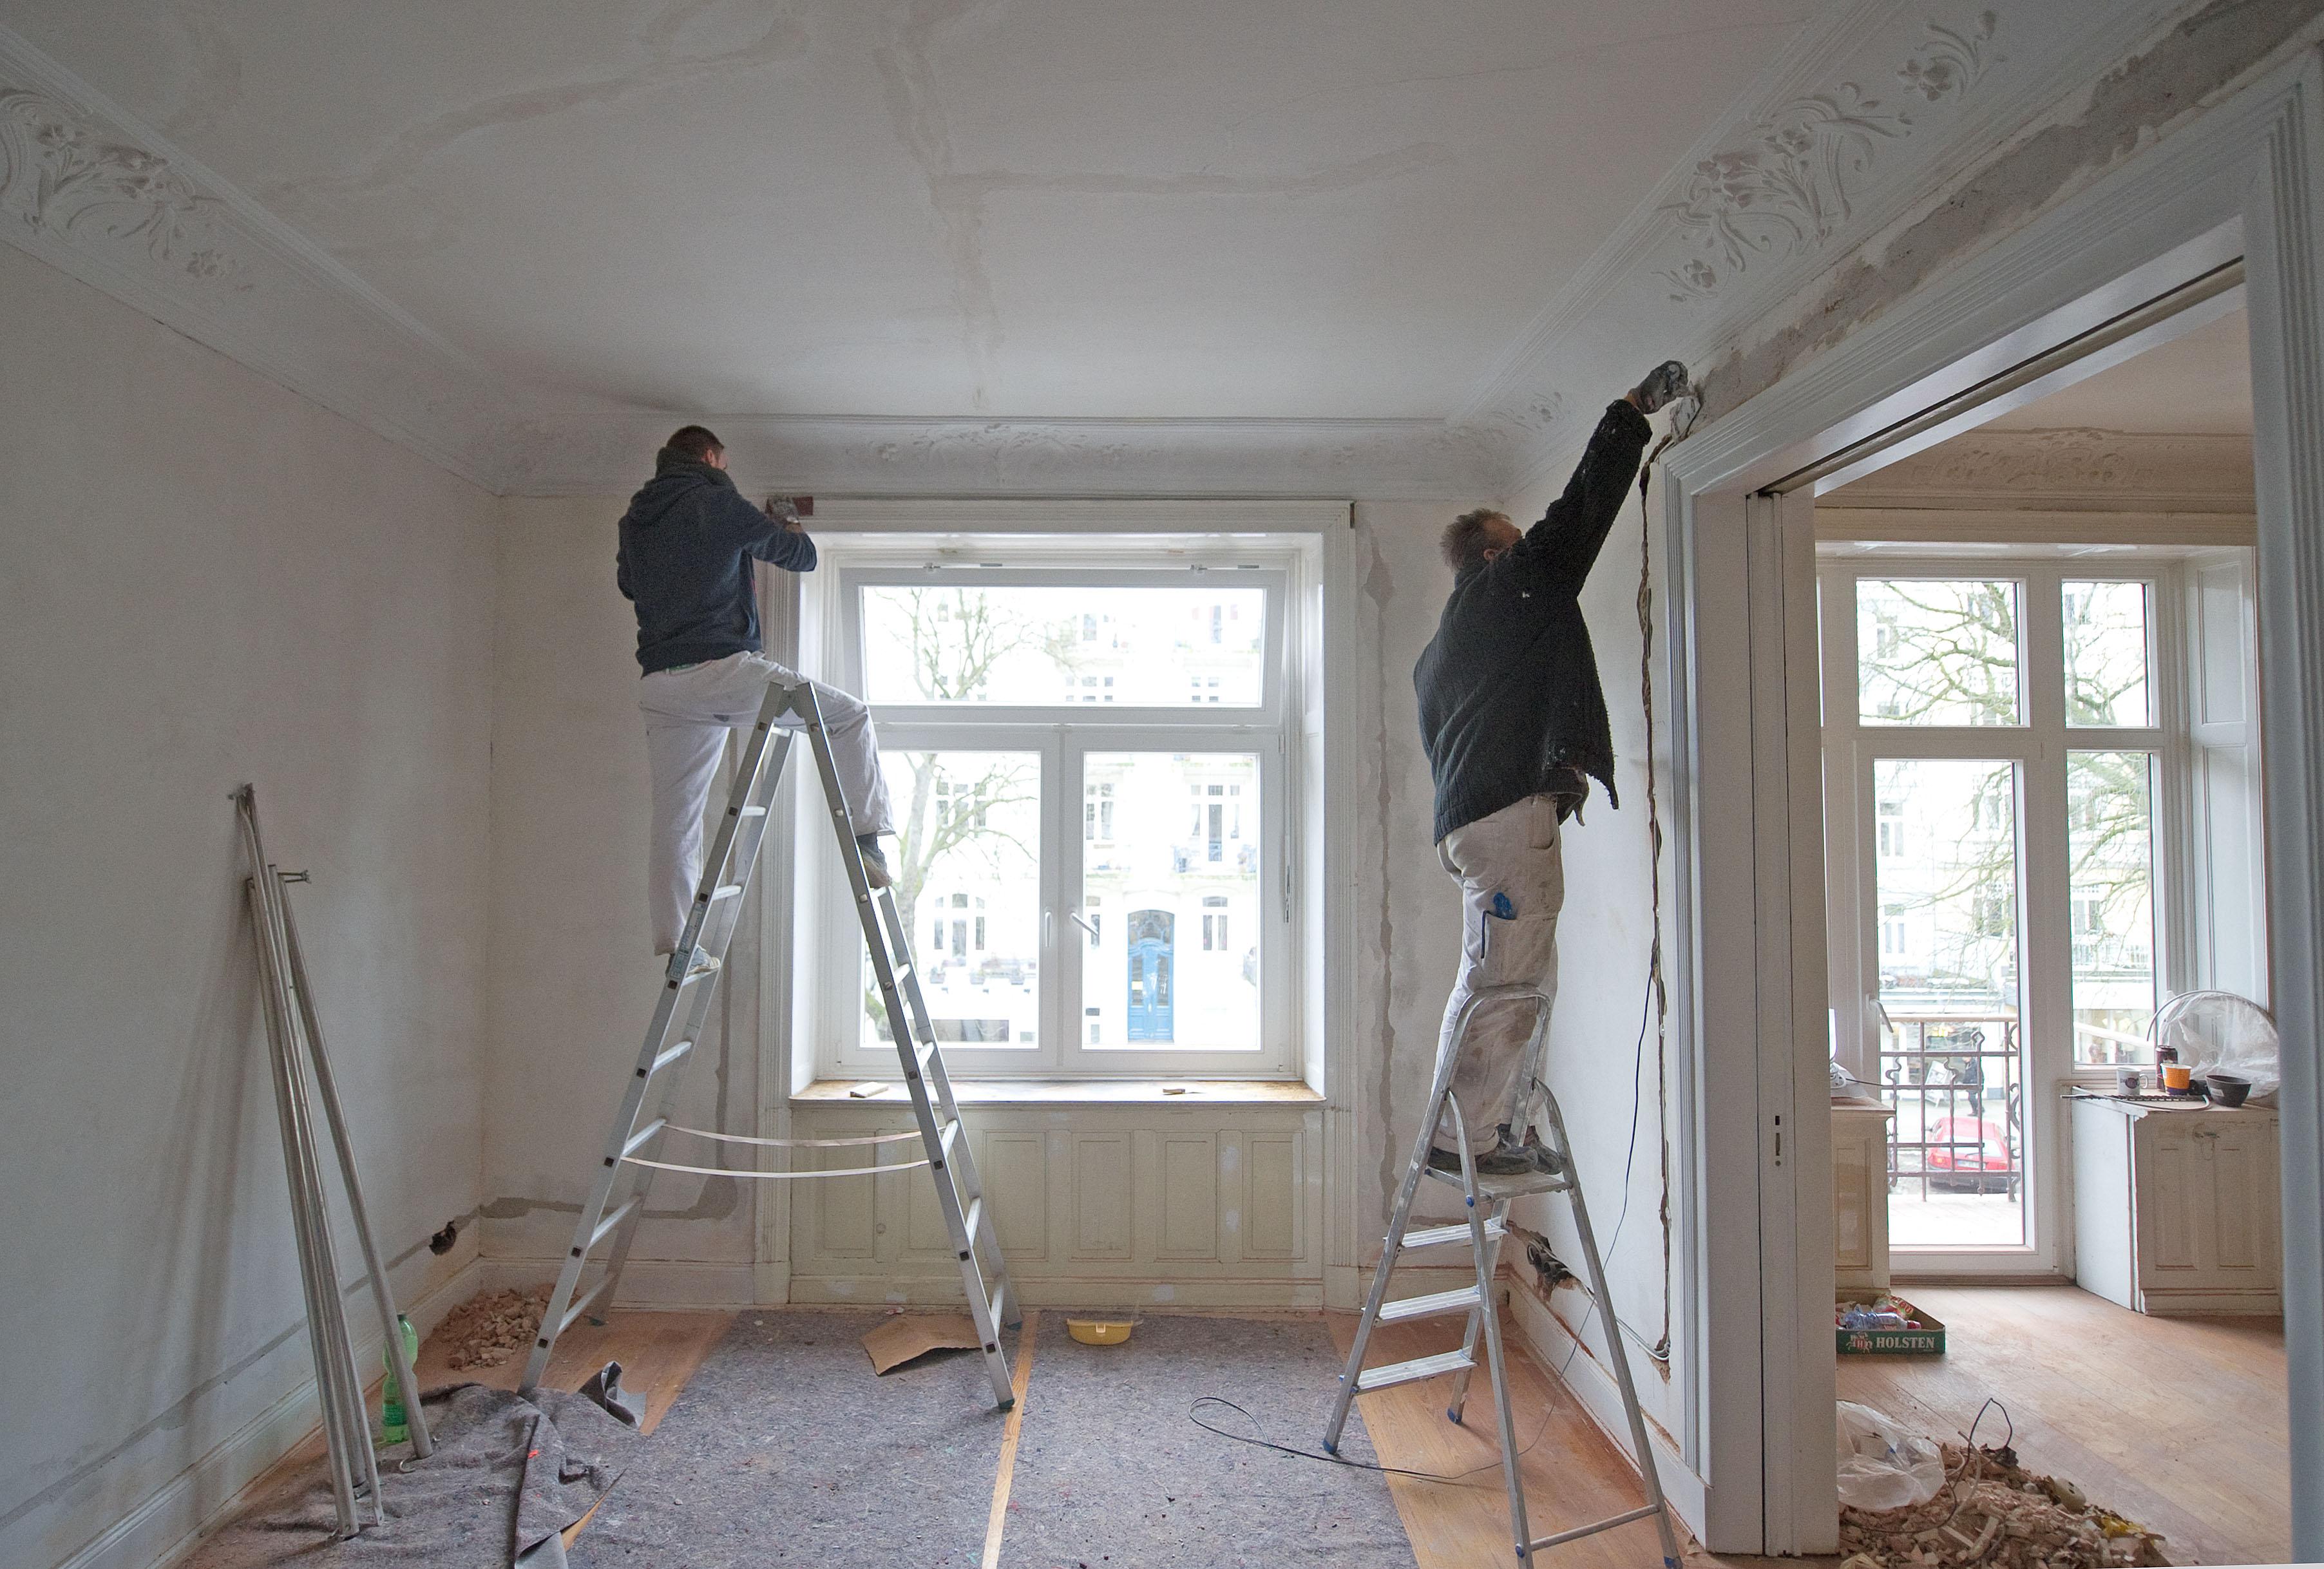 stand up comedy farbe hobelst du nicht mein freund. Black Bedroom Furniture Sets. Home Design Ideas